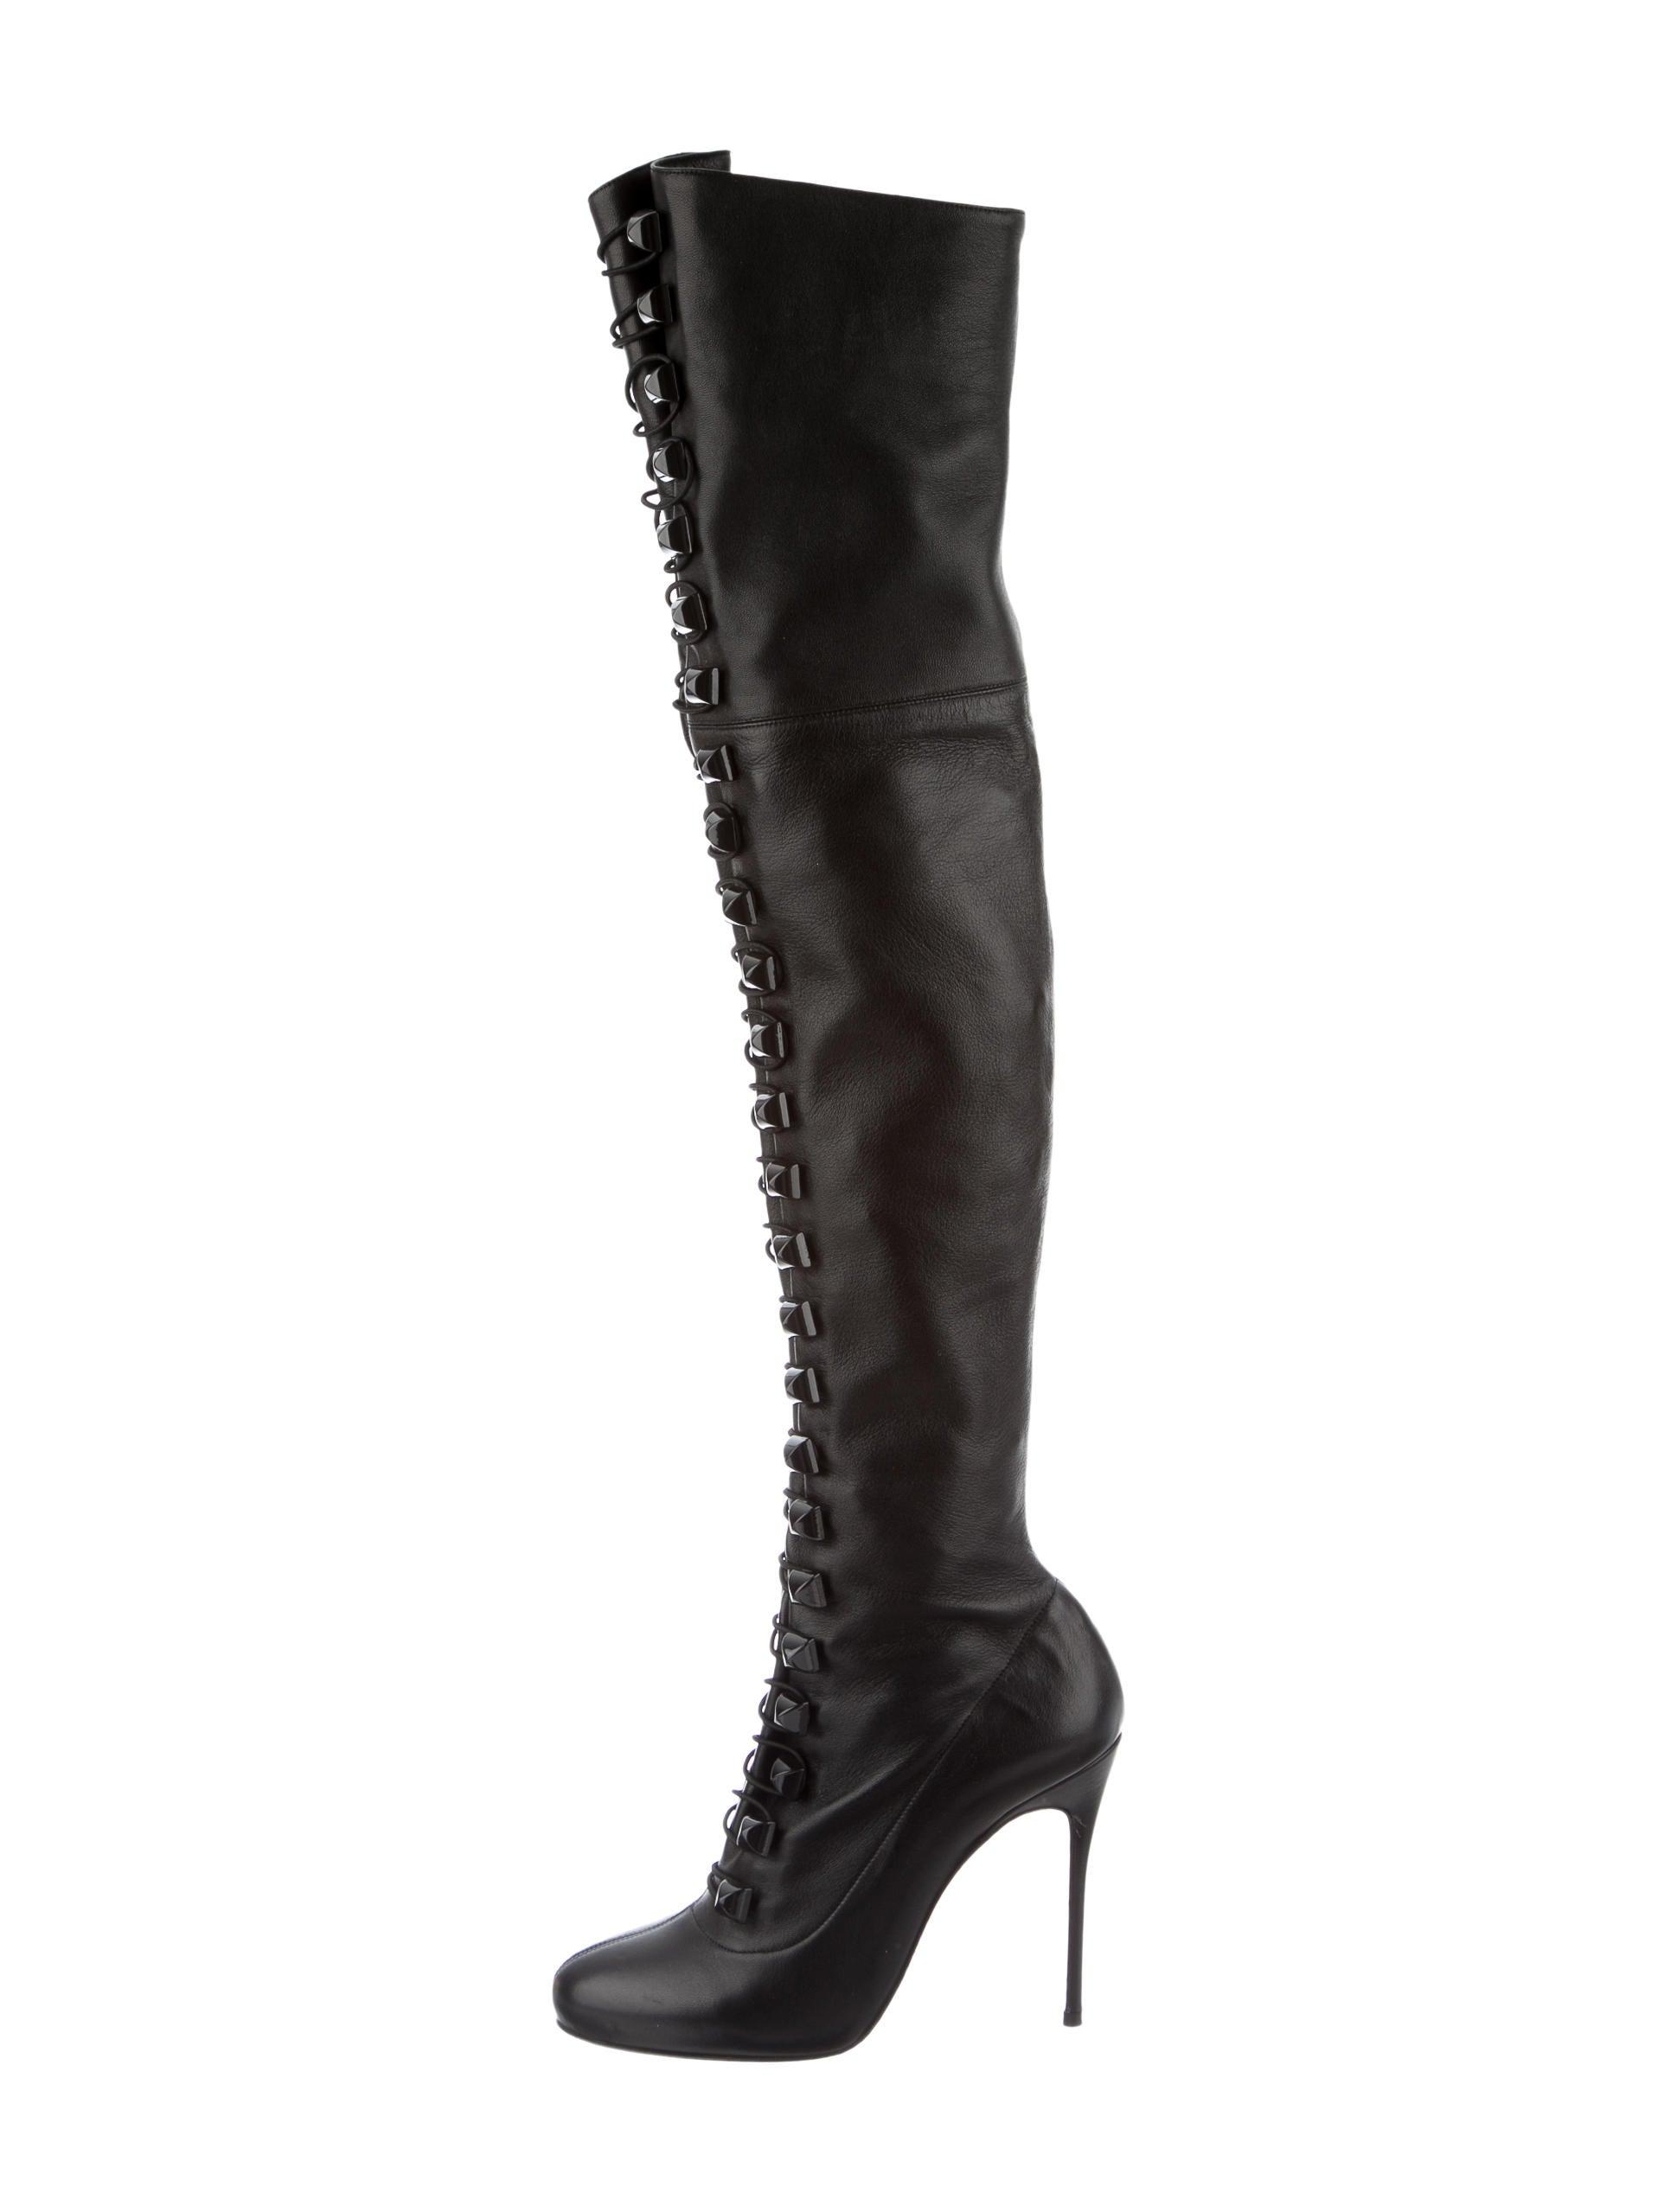 Artesur ? christian louboutin knee-high boots Black leather toggle ...